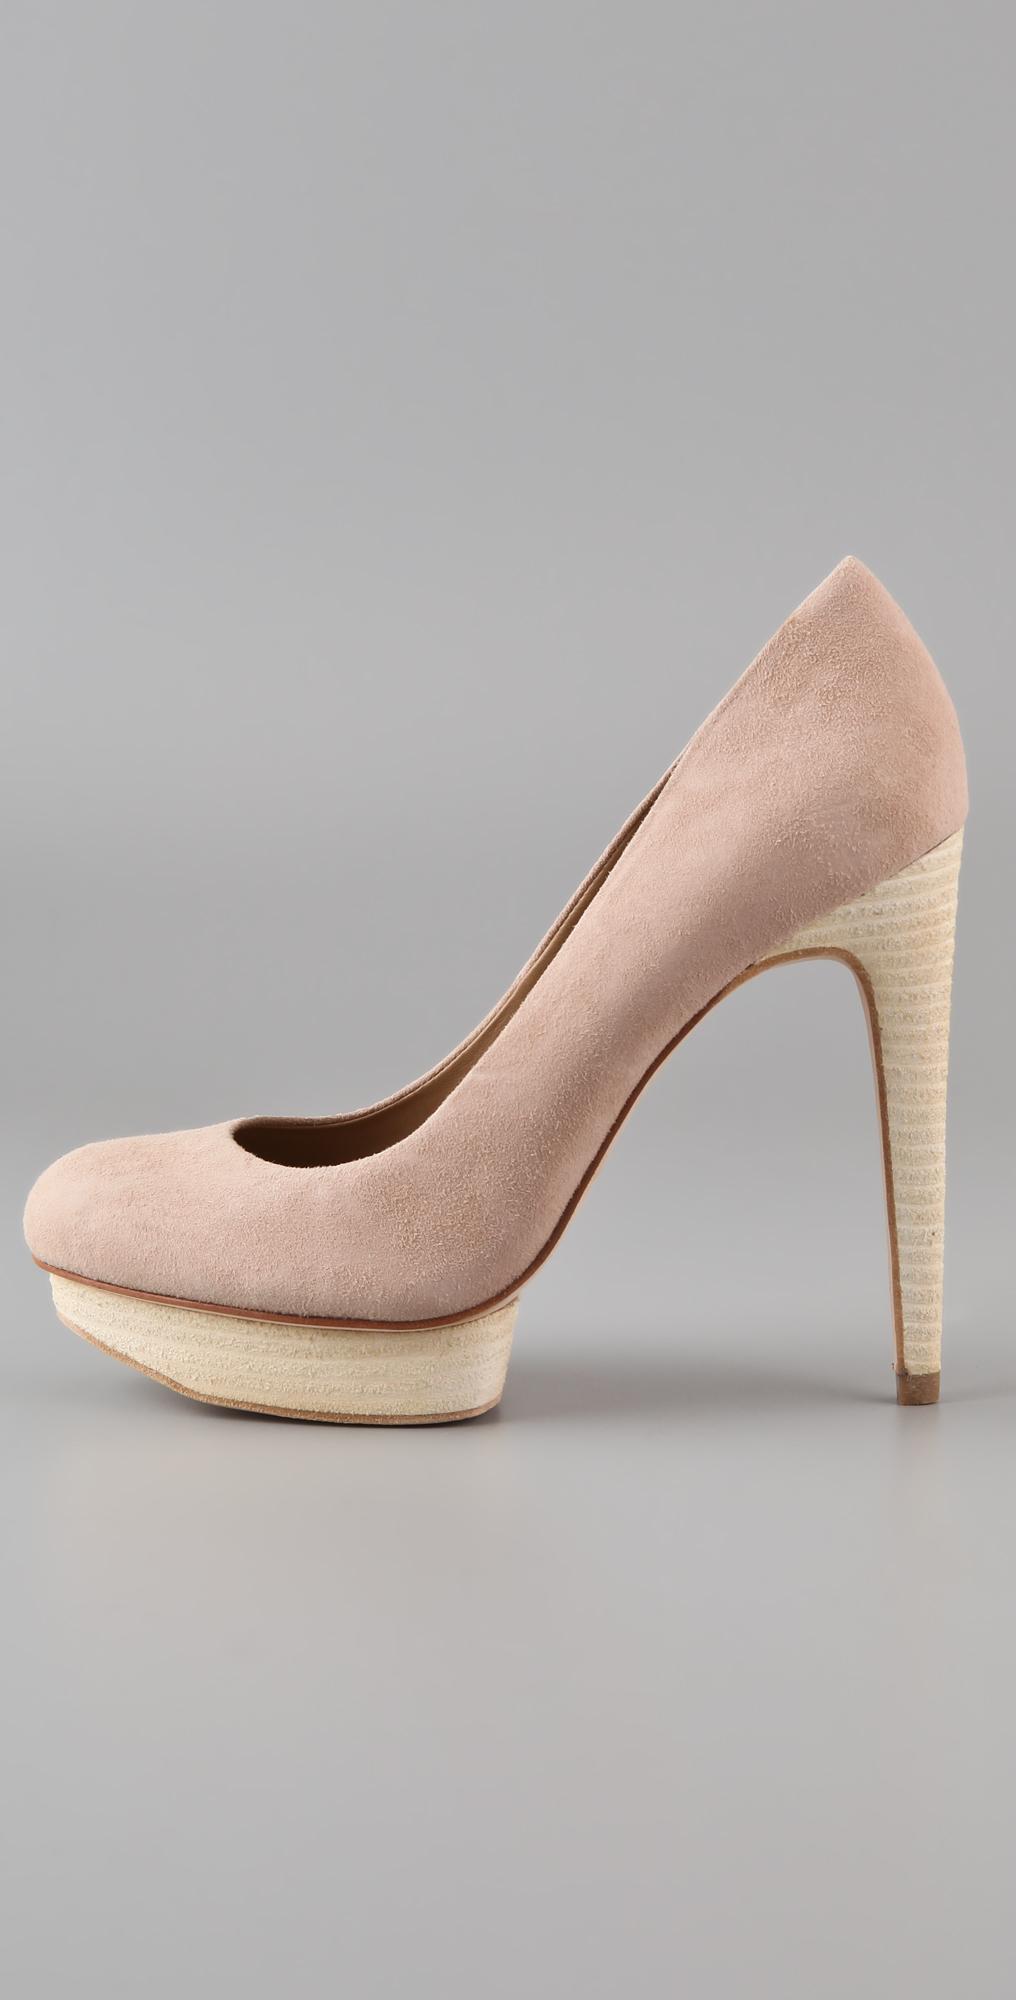 3322a6089cdc21 Bcbgmaxazria foster platform pumps shopbop jpg 1016x2000 Bcbg natural heels